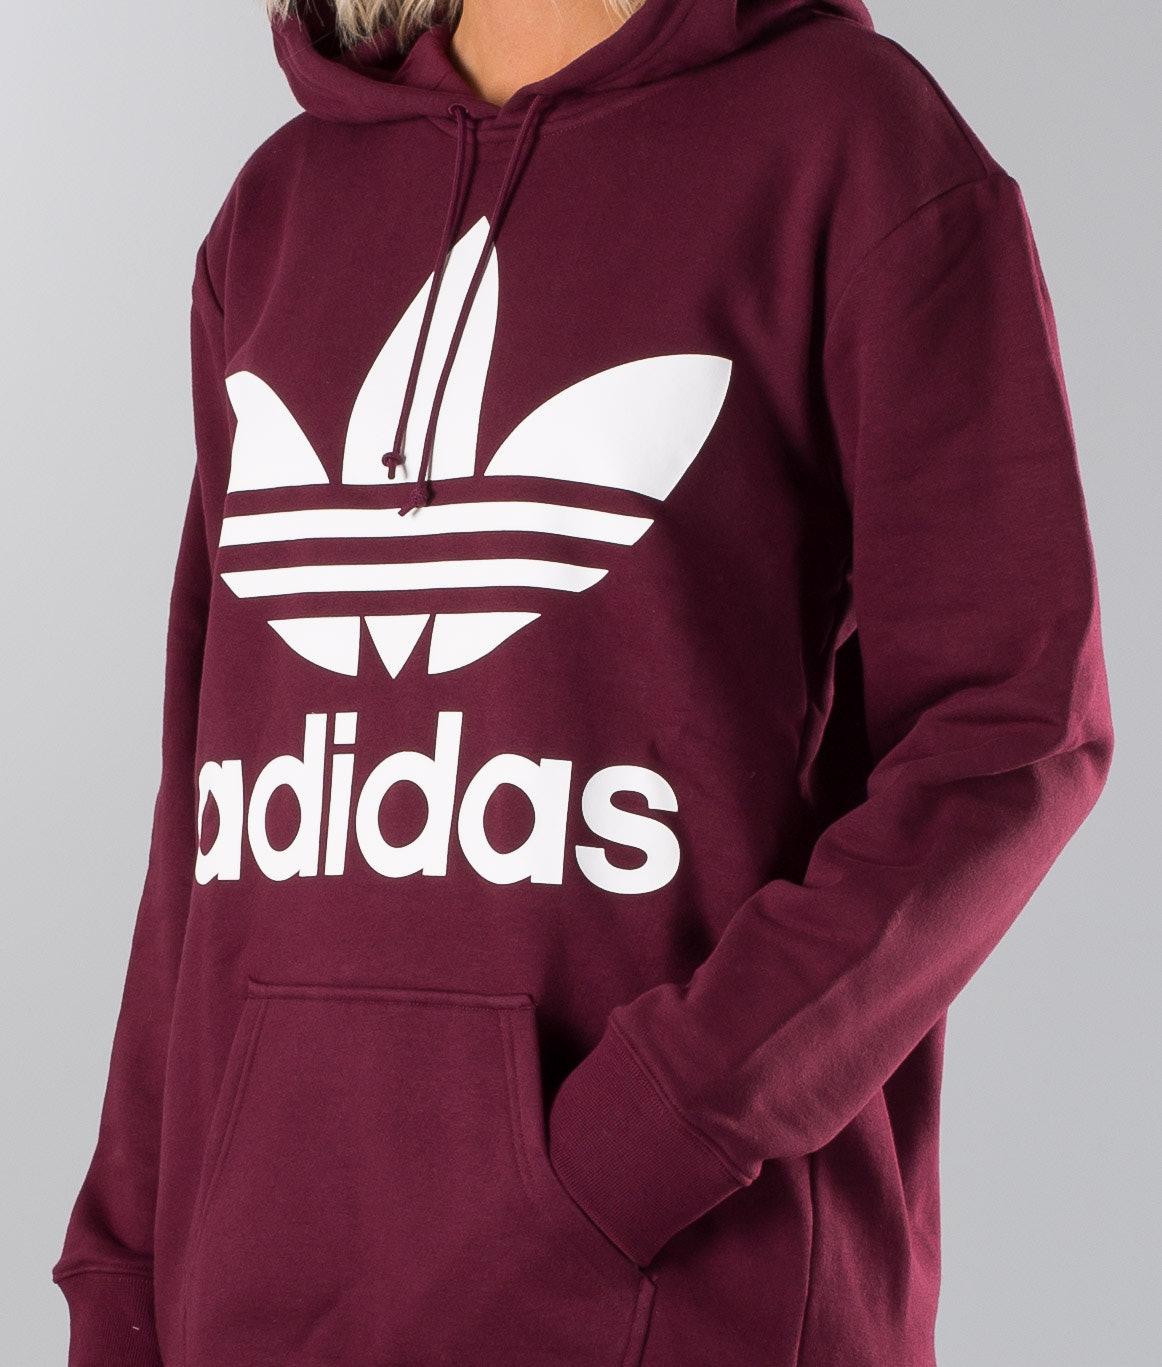 Adidas Originals Boyfriend Trefoil Hood Maroon - Ridestore.com 37485ecc35